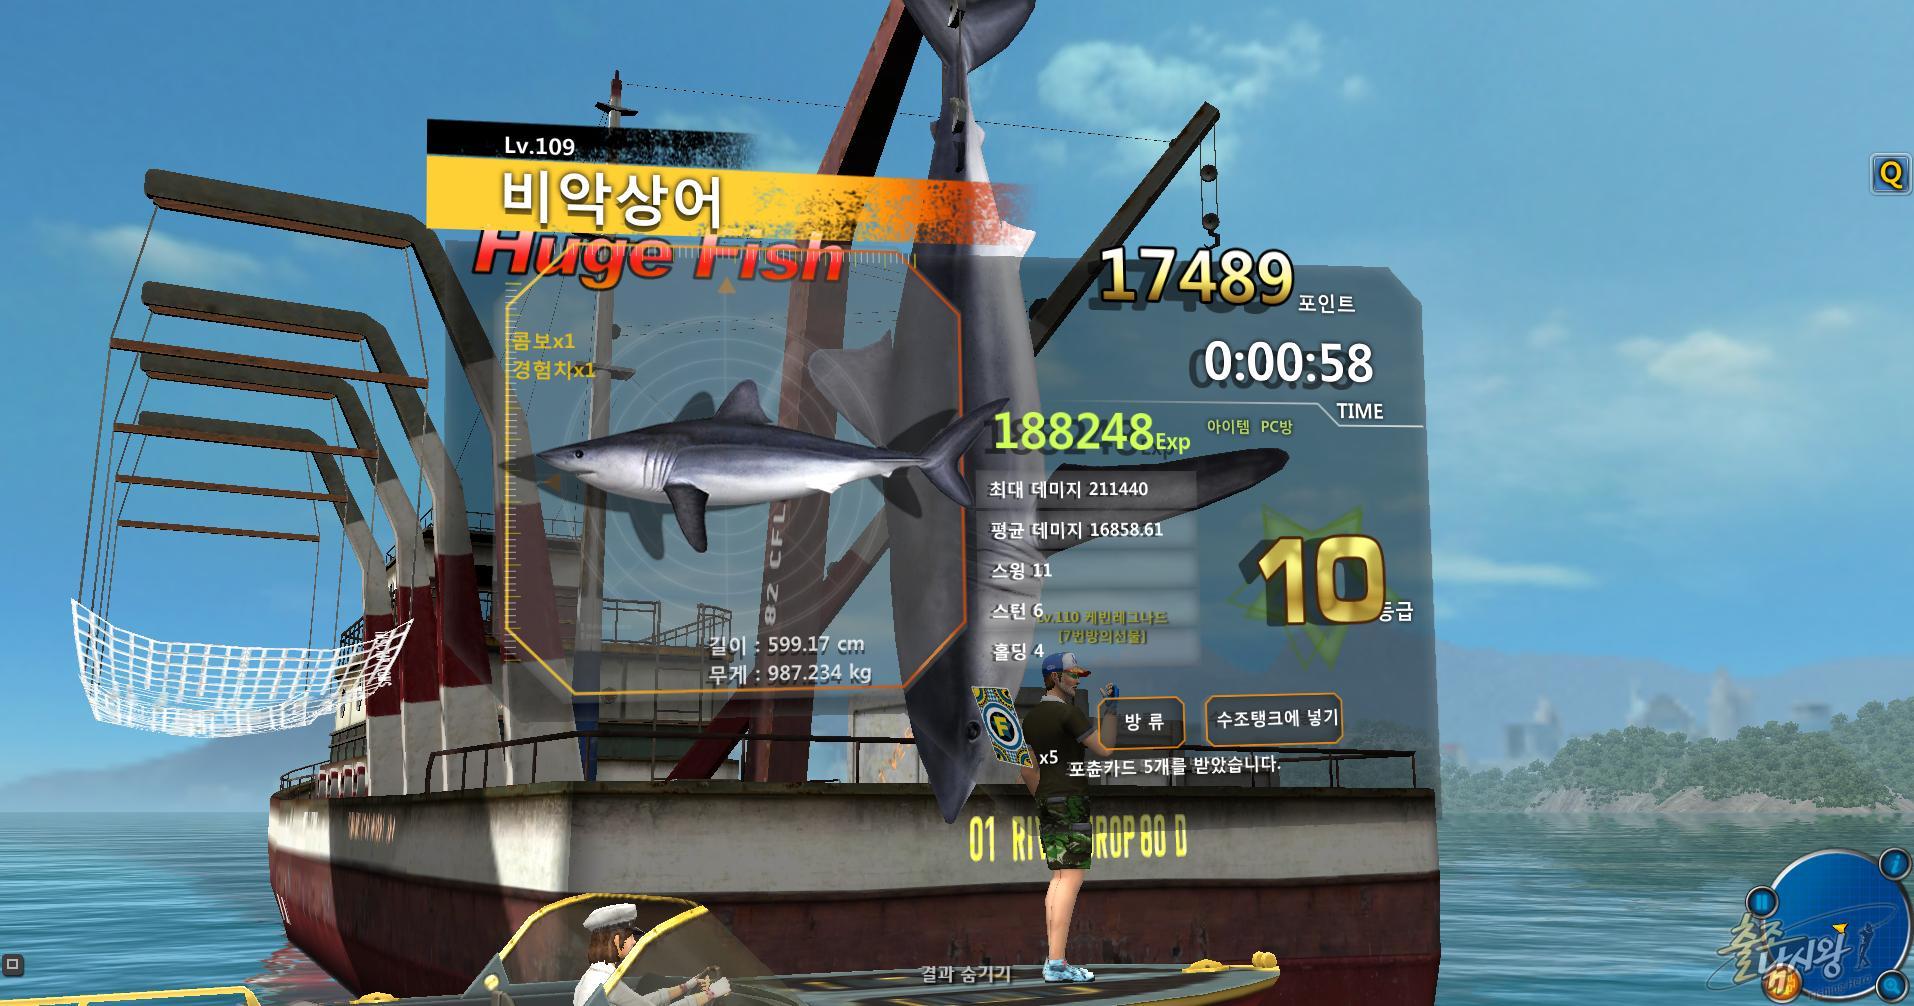 FishingHero_0100.jpg